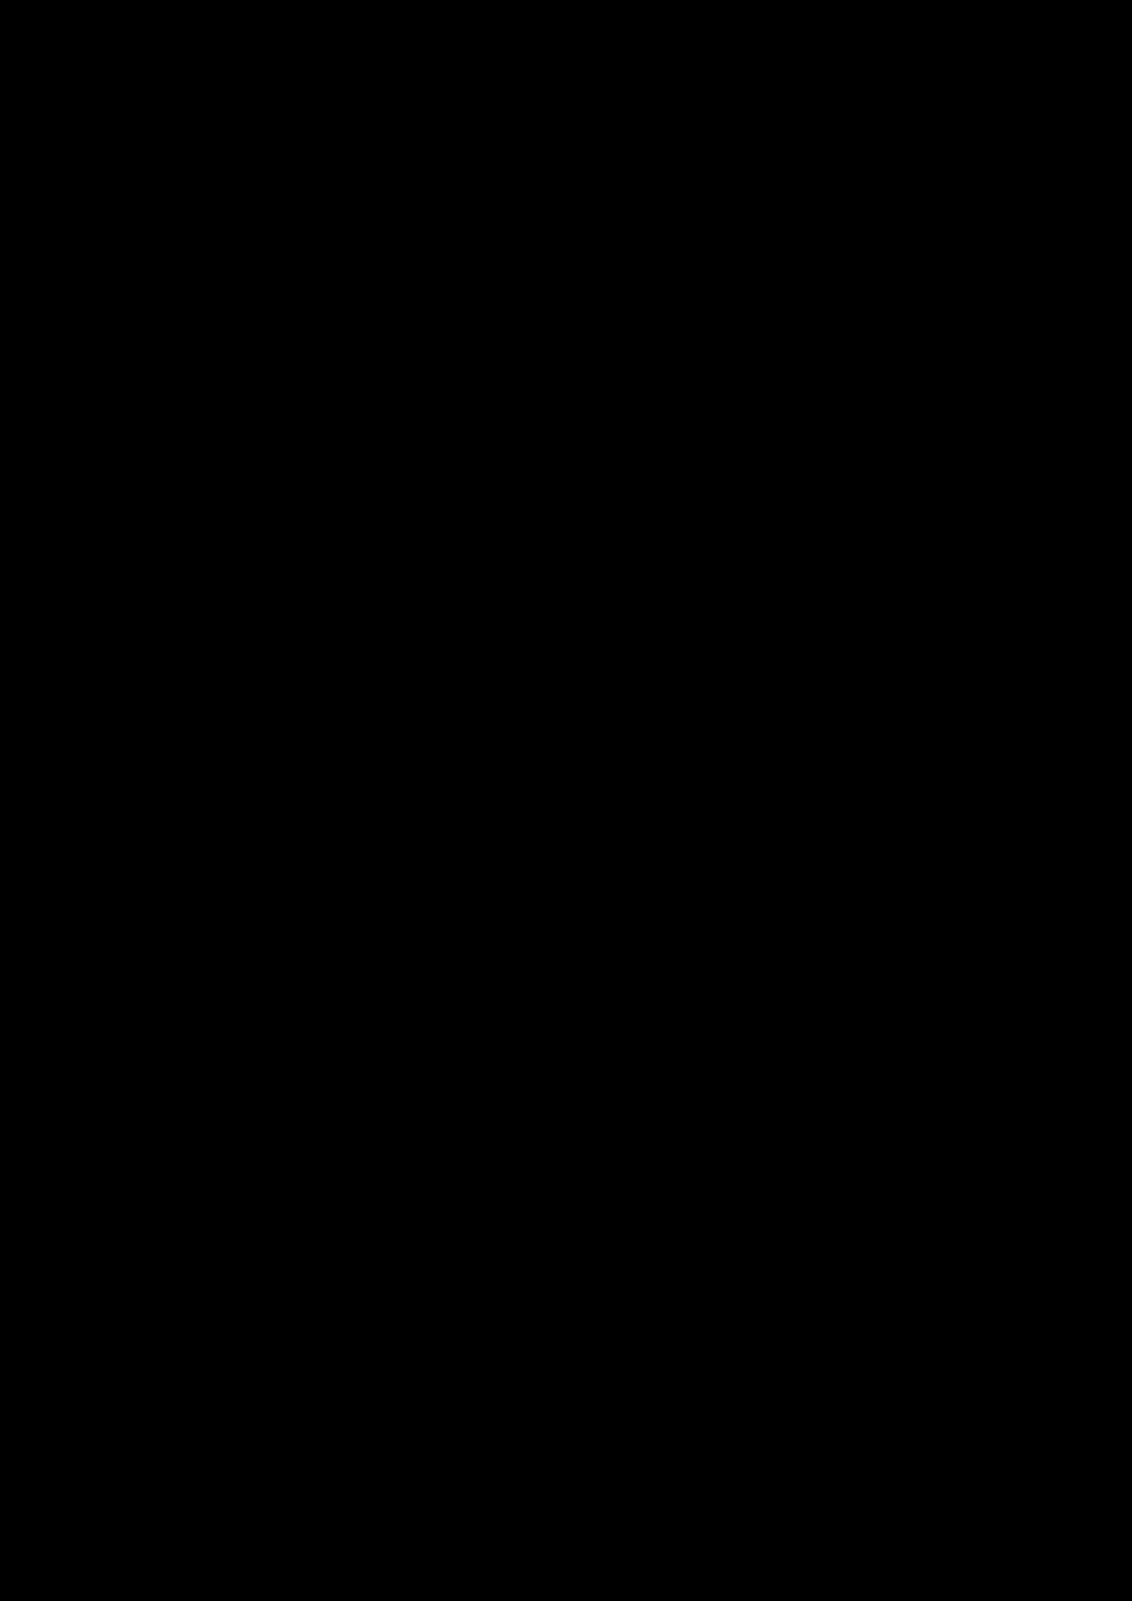 Korolevstvo slez slide, Image 17